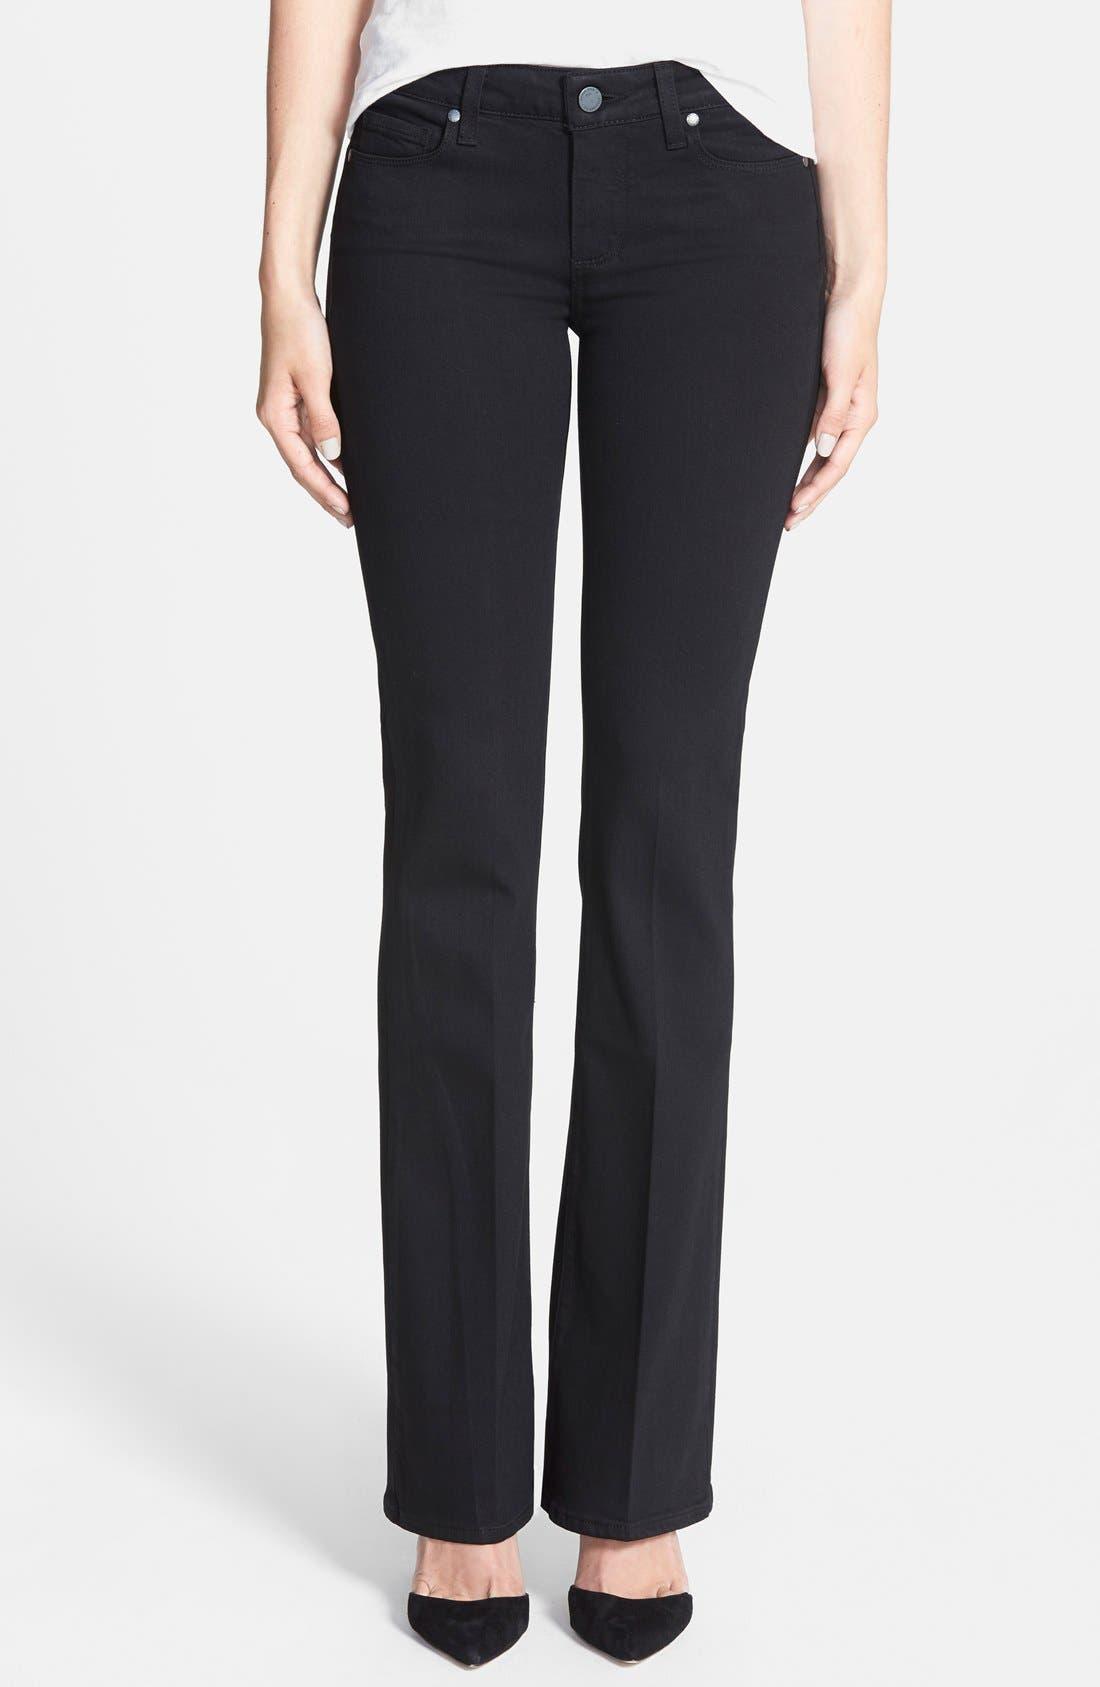 Transcend - Skyline Bootcut Jeans,                         Main,                         color, Black Shadow